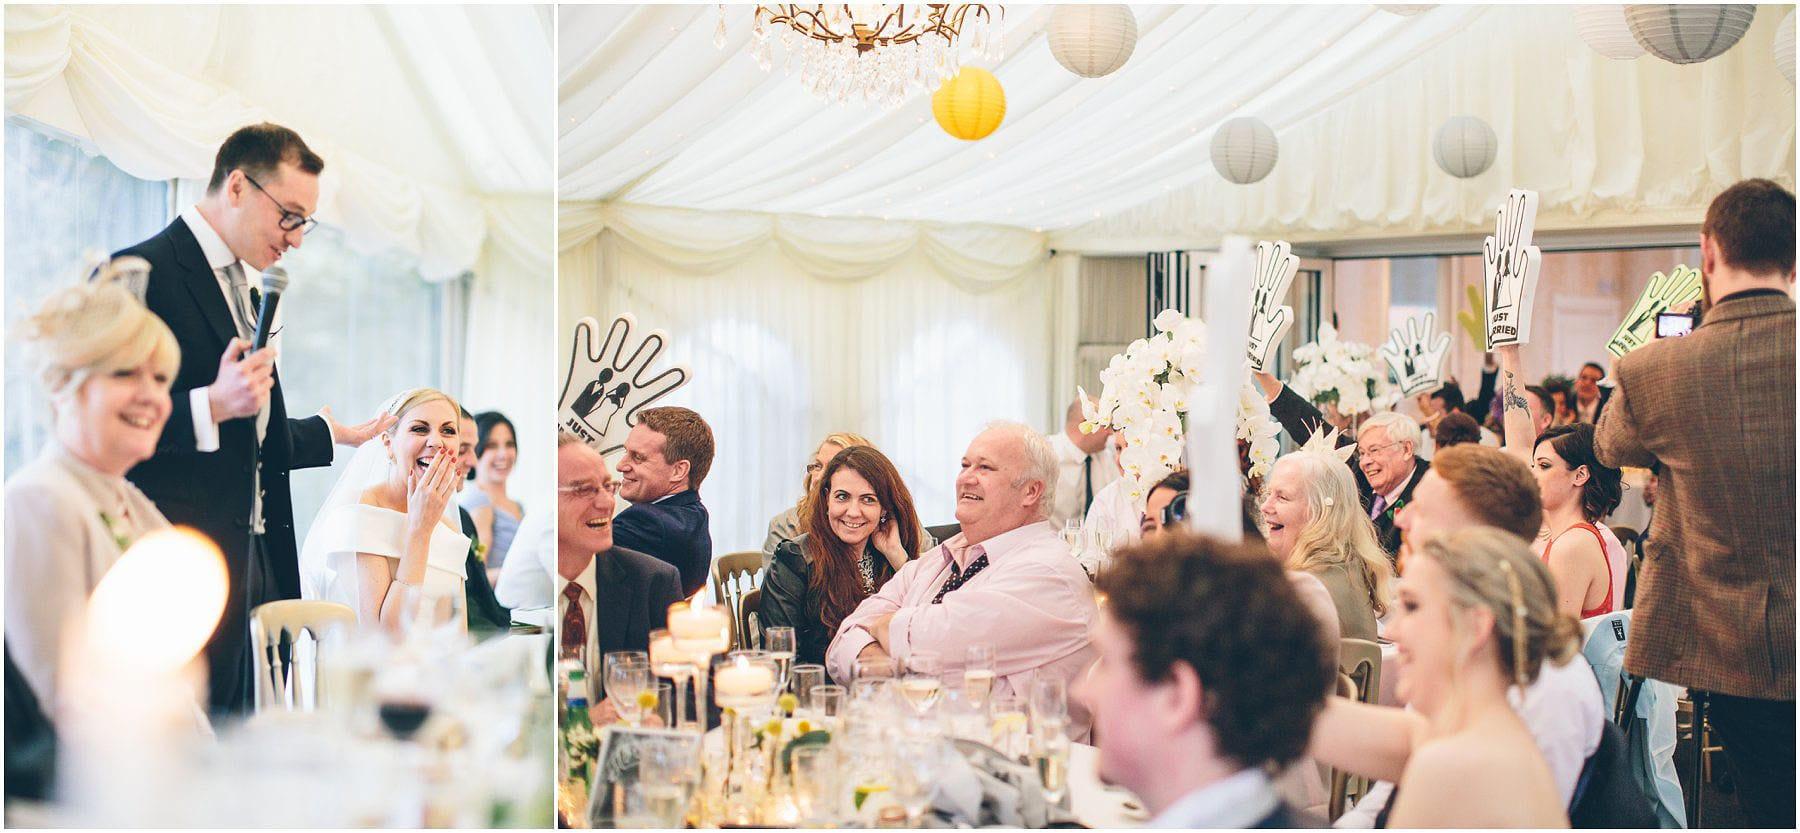 Capesthorne_Hall_Wedding_Photography_0115